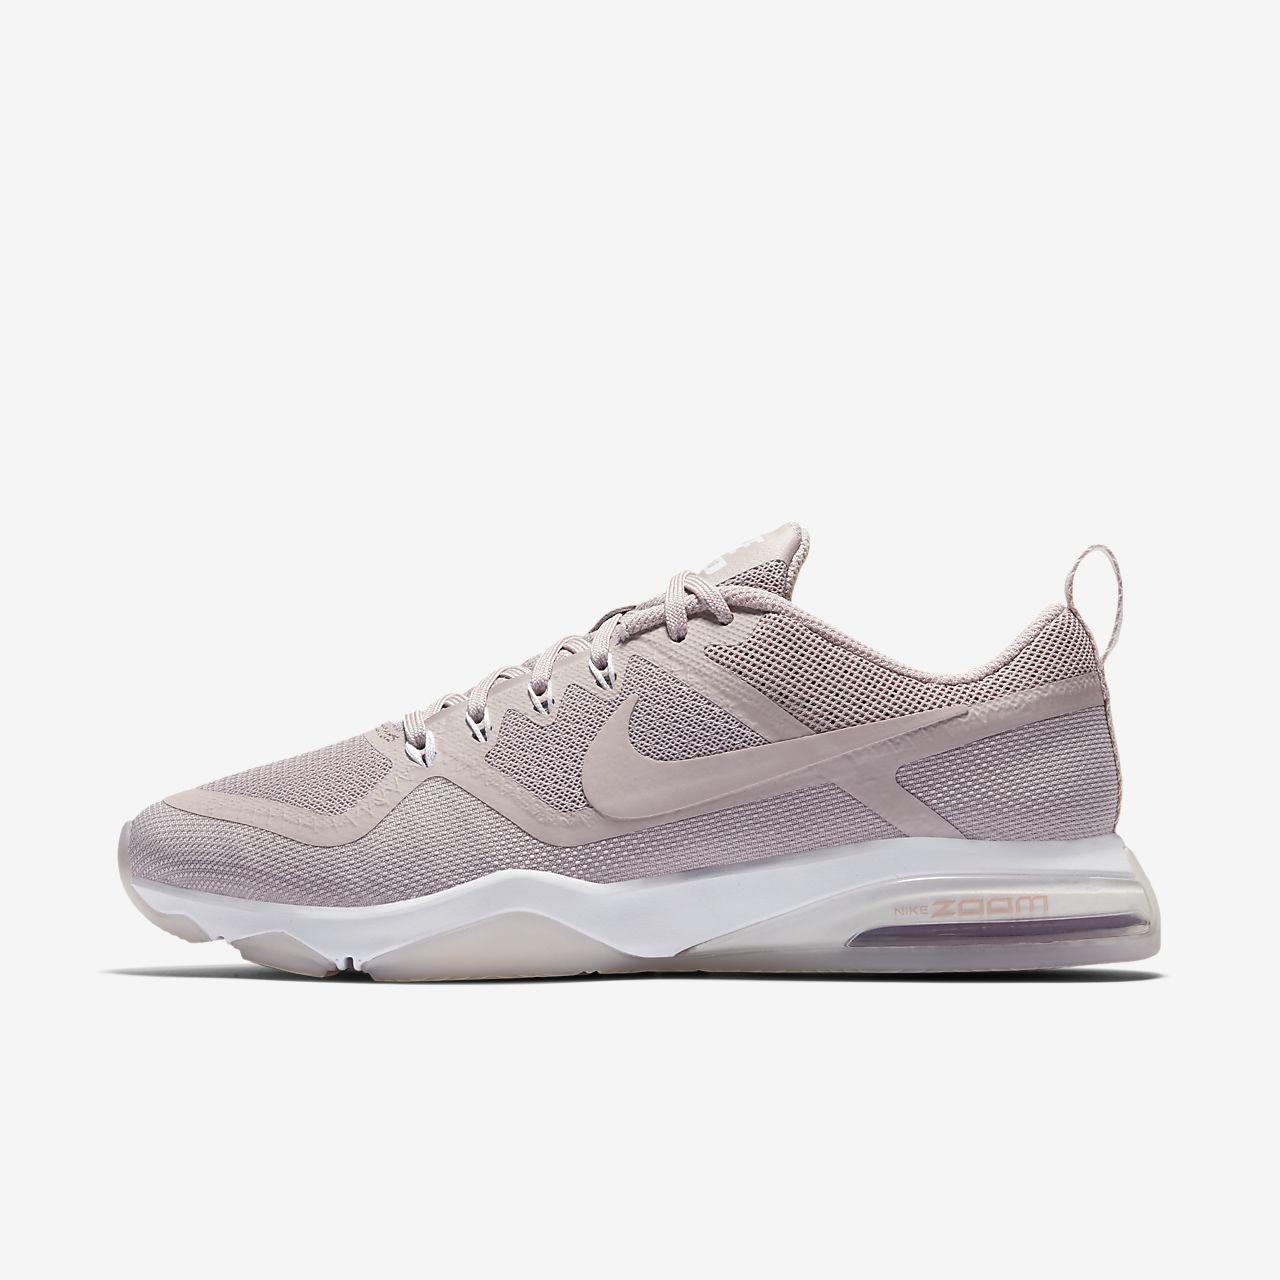 ... Nike Zoom Fitness Women's Training Shoe